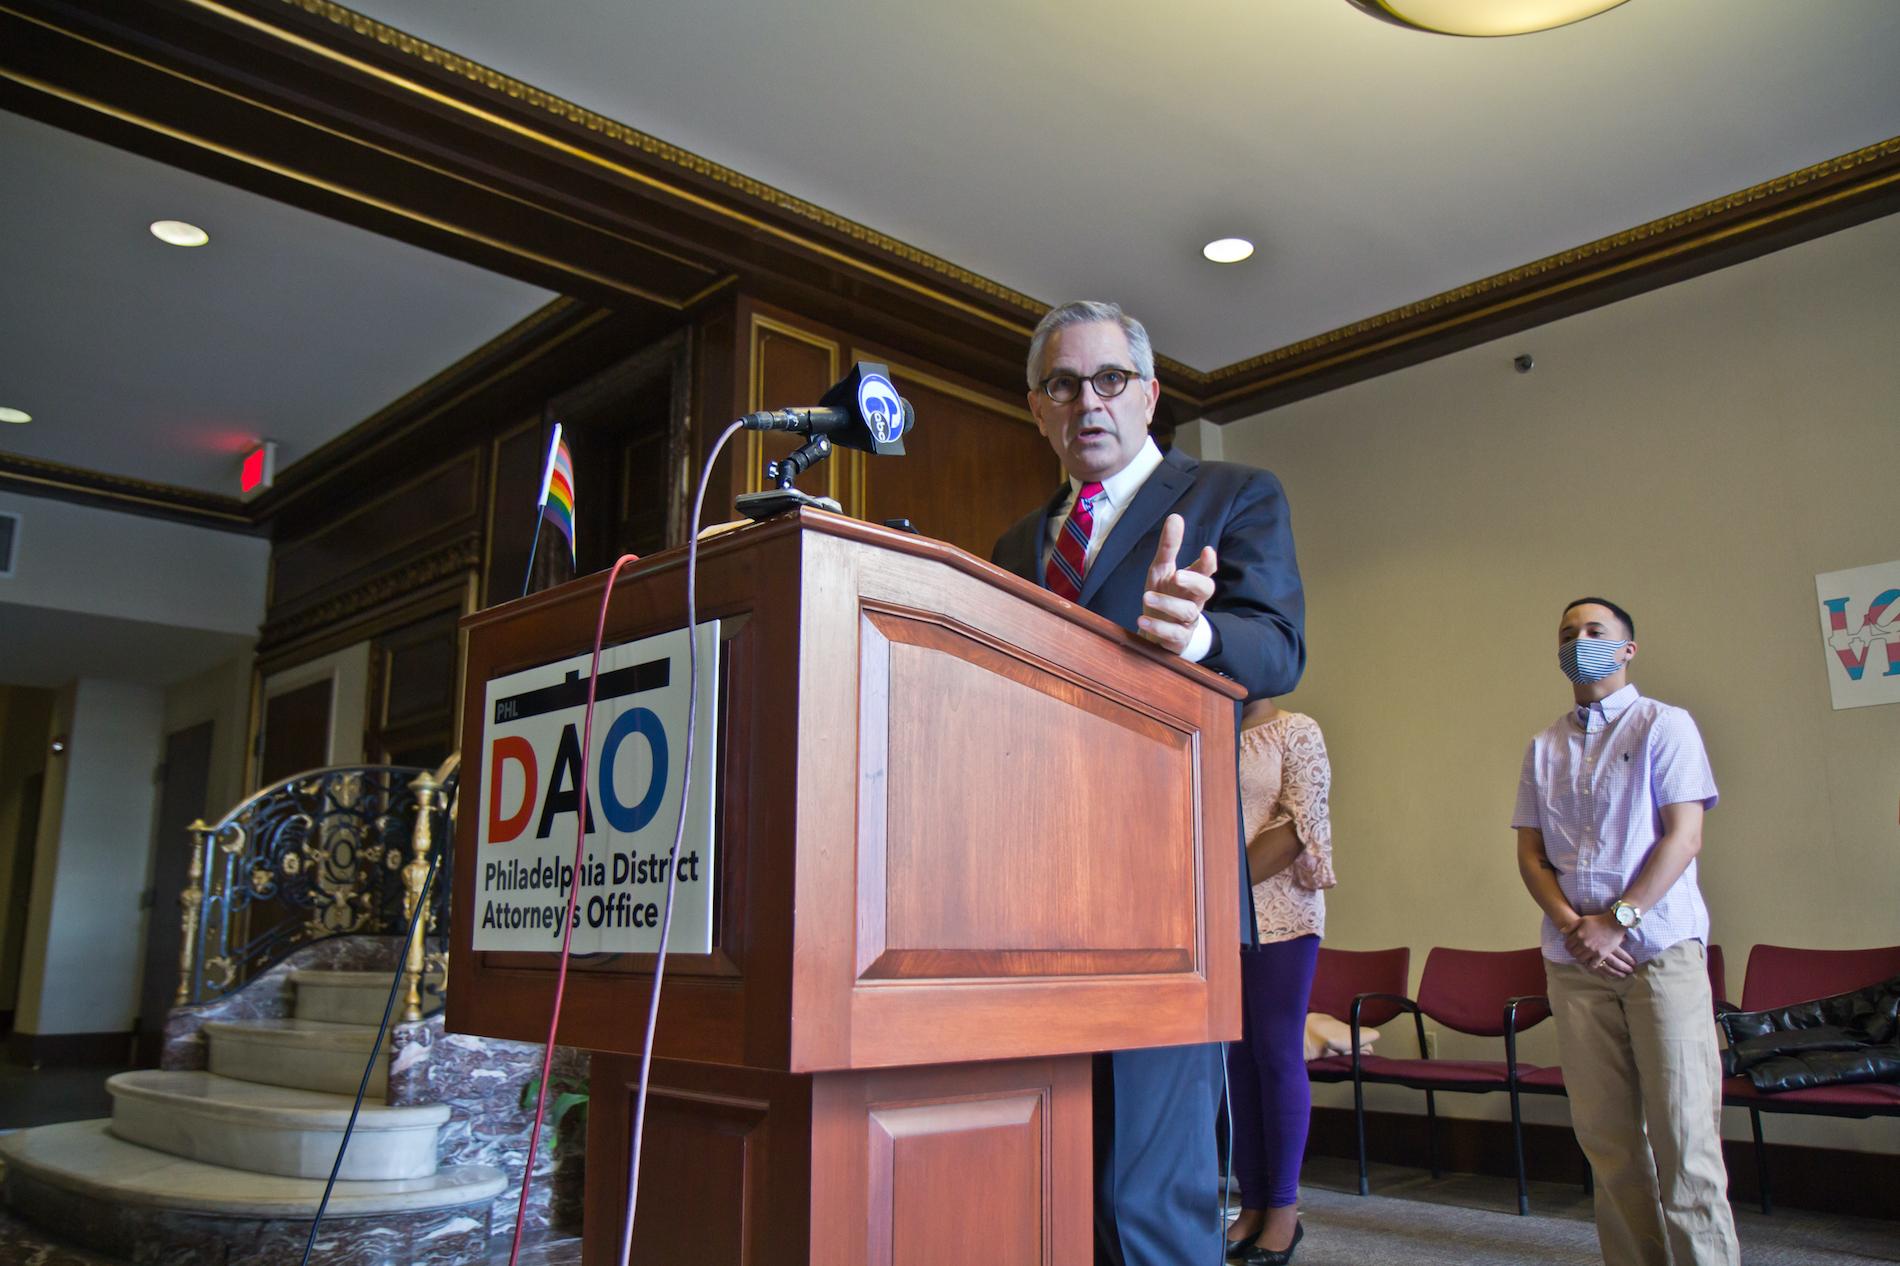 Philadelphia District Attorney Larry Krasner speaks at a press conference